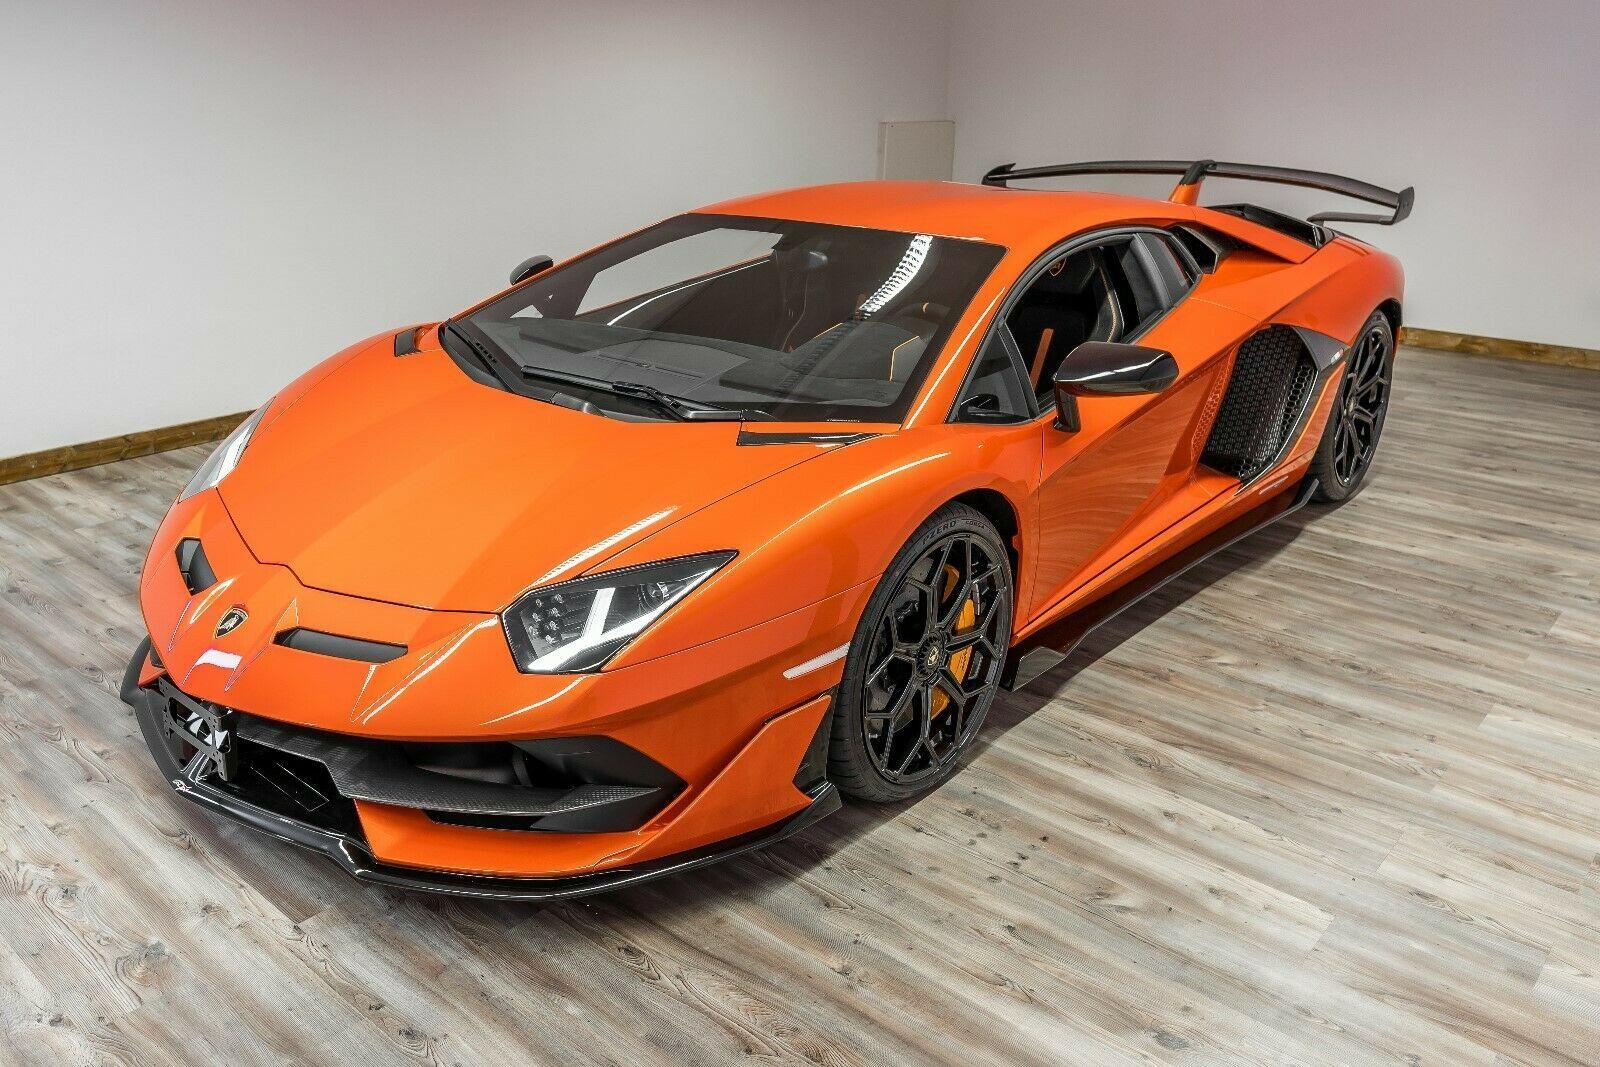 Lamborghini Aventador SVJ – Luxury Pulse Cars – Germany